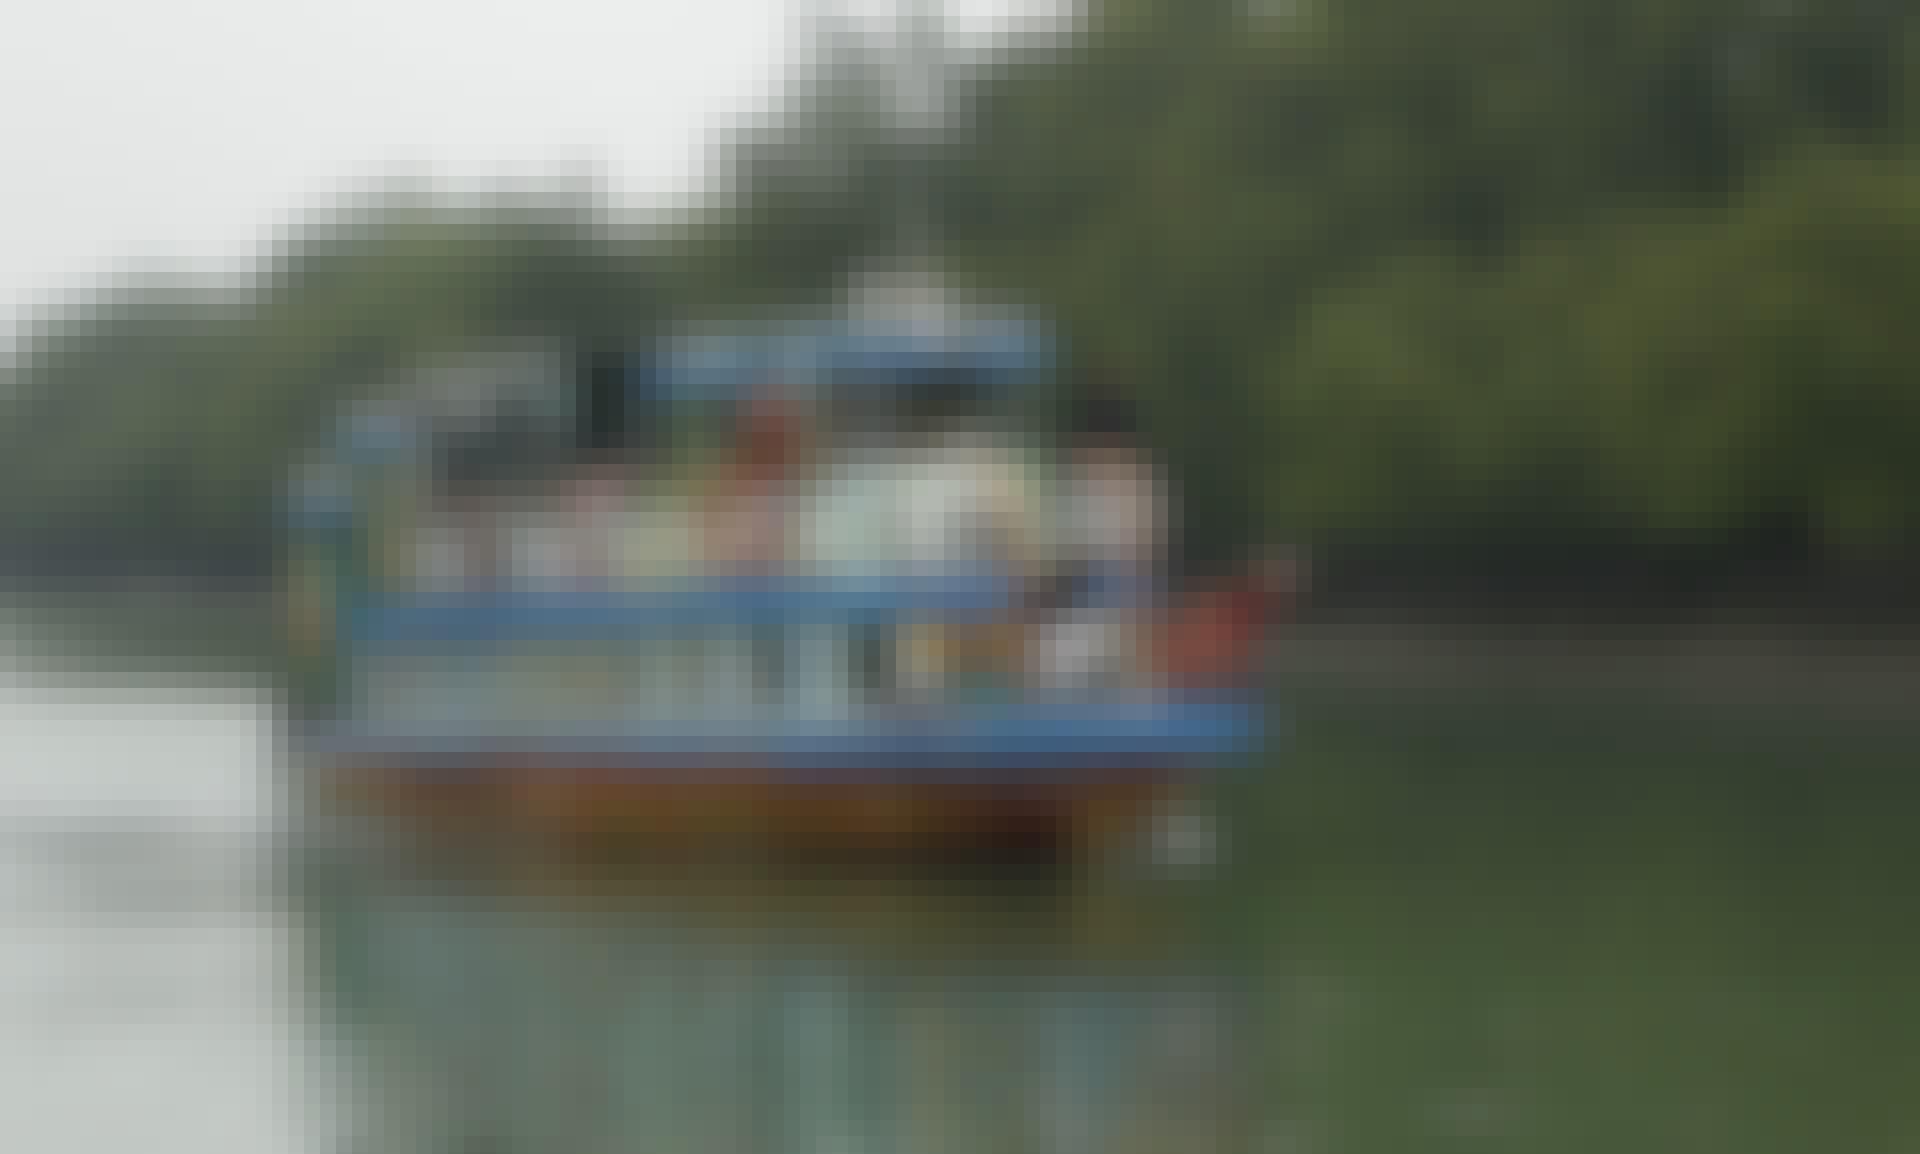 Sundarban Tour - World Largest Mangrove Forest with Mini Luxurious Tourist Vessel